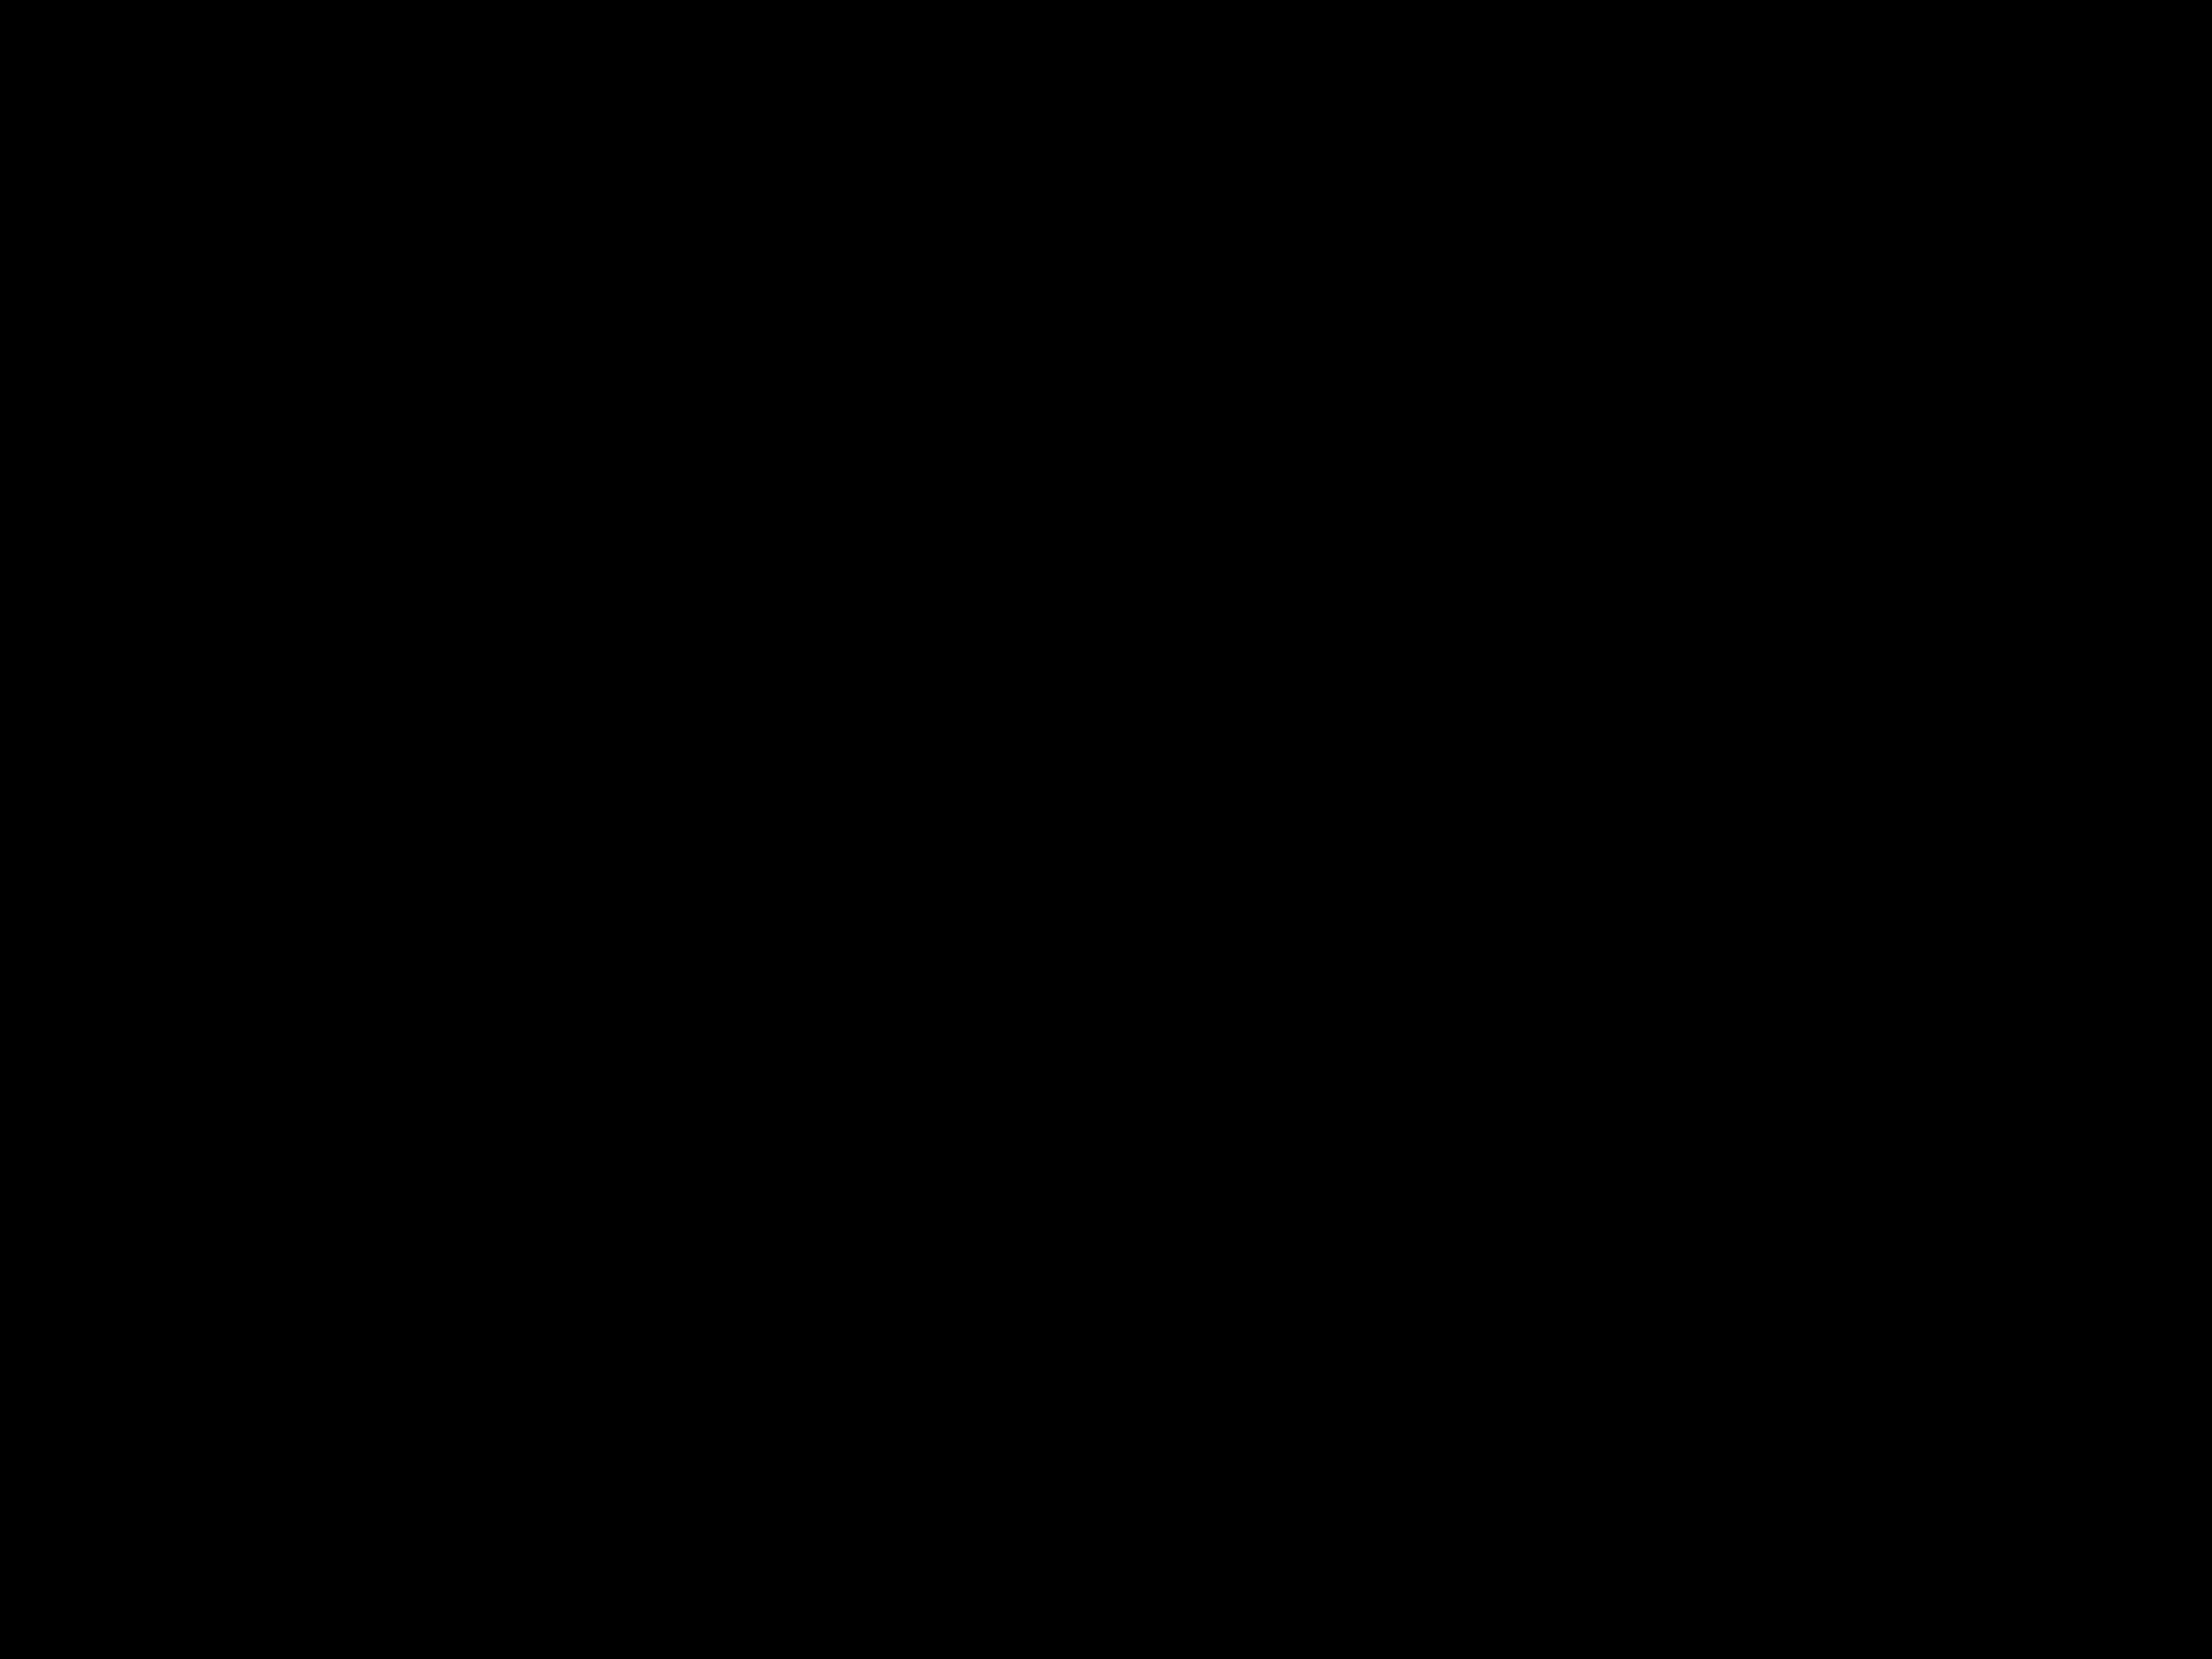 img_0555